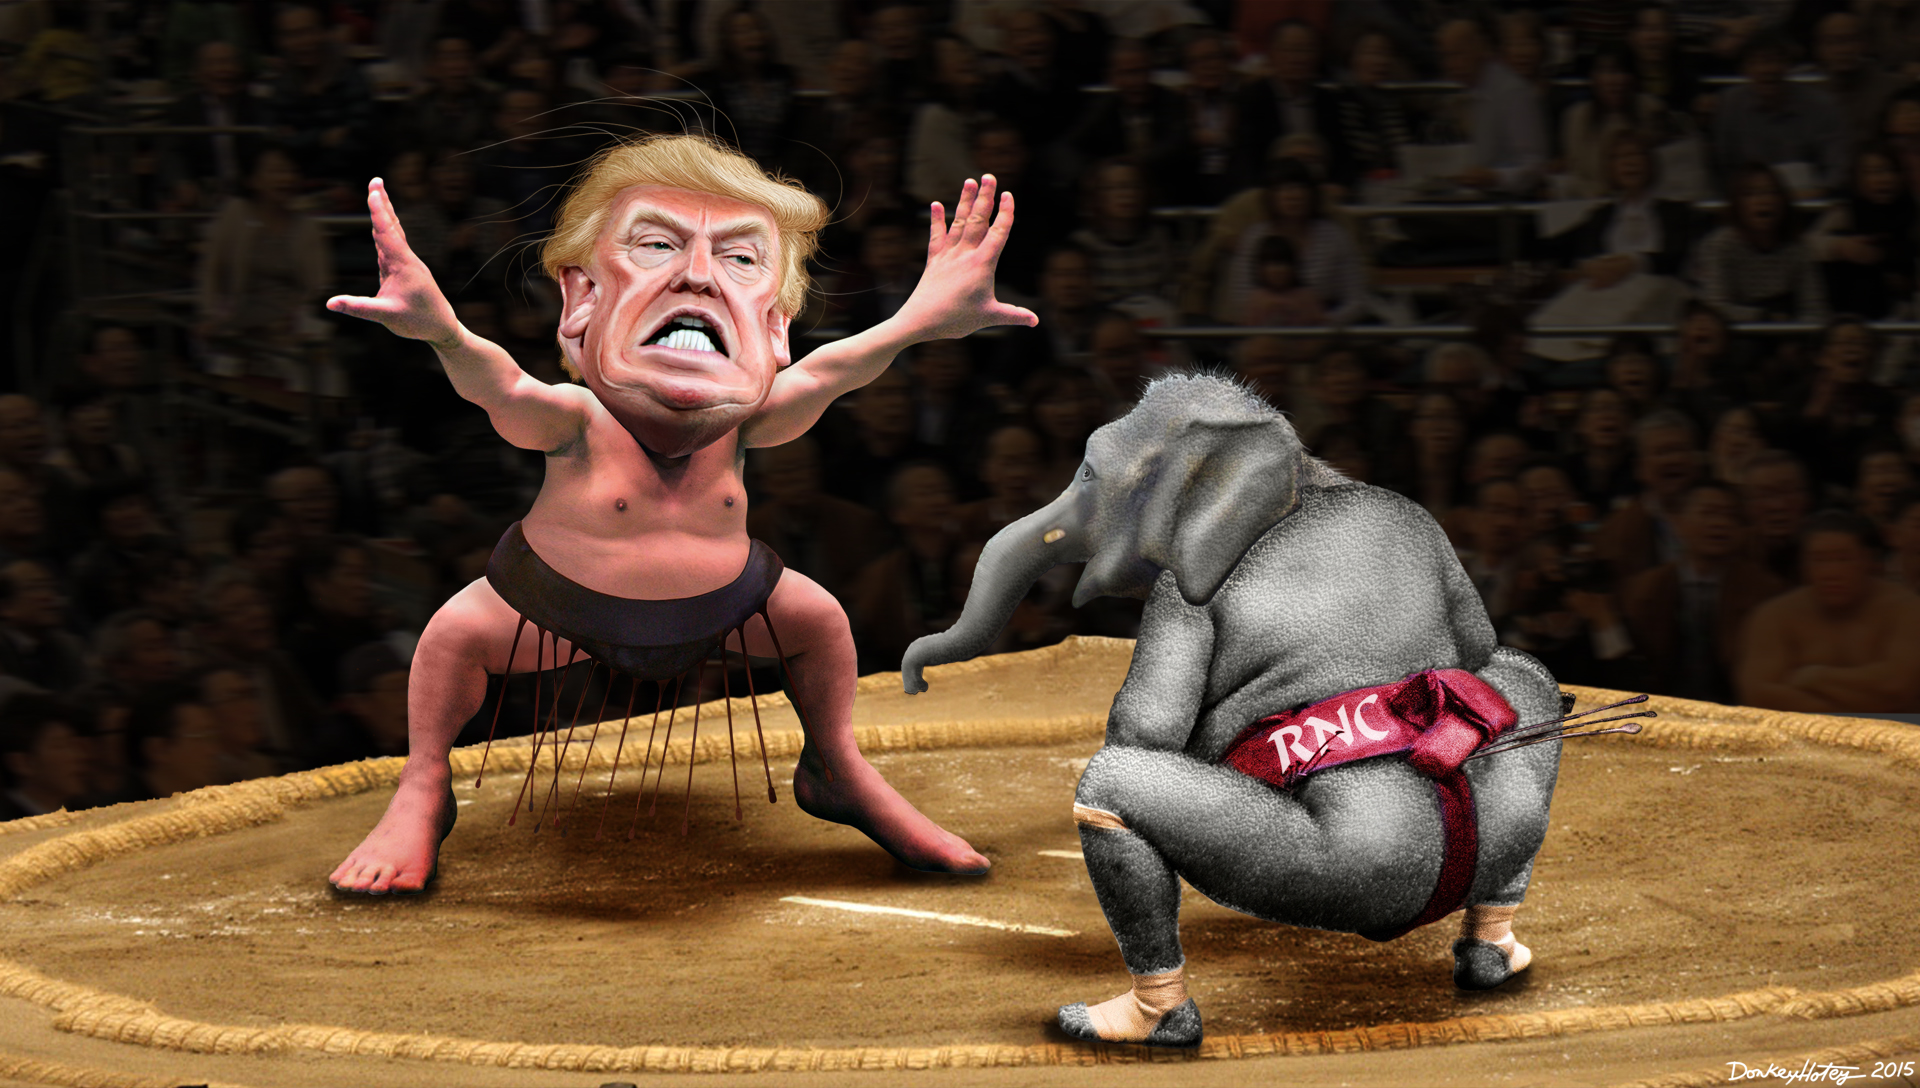 Donald_Trump_Sumo_Main_1920x1080.jpg